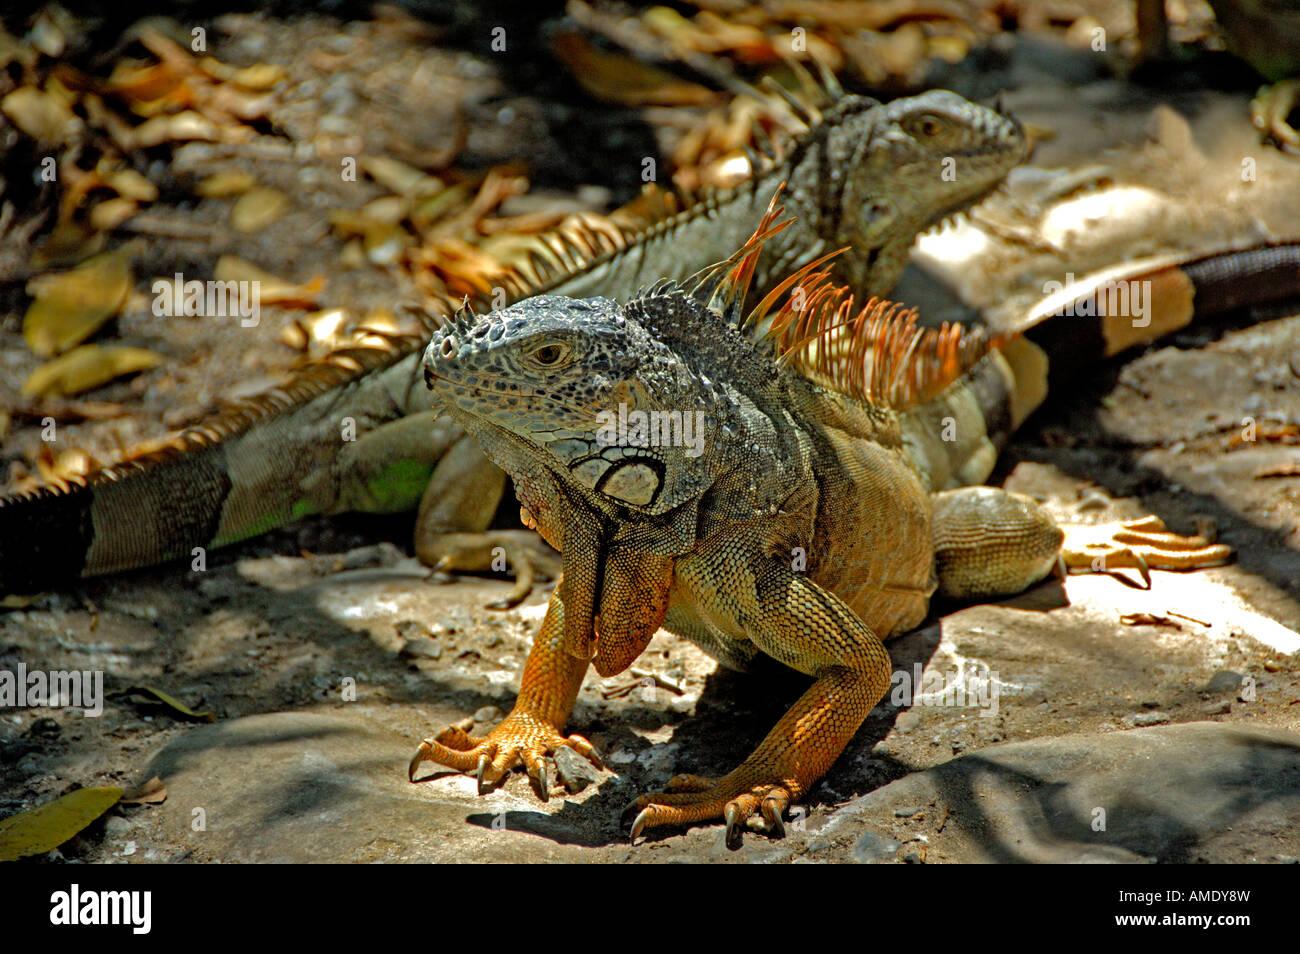 Nordamerika, Mexiko, Bundesstaat Guerrero, Ixtapa/Zihuatanejo & Zihuatanejo. Ixtapa/Zihuatanejo, wilde Leguane. Stockbild